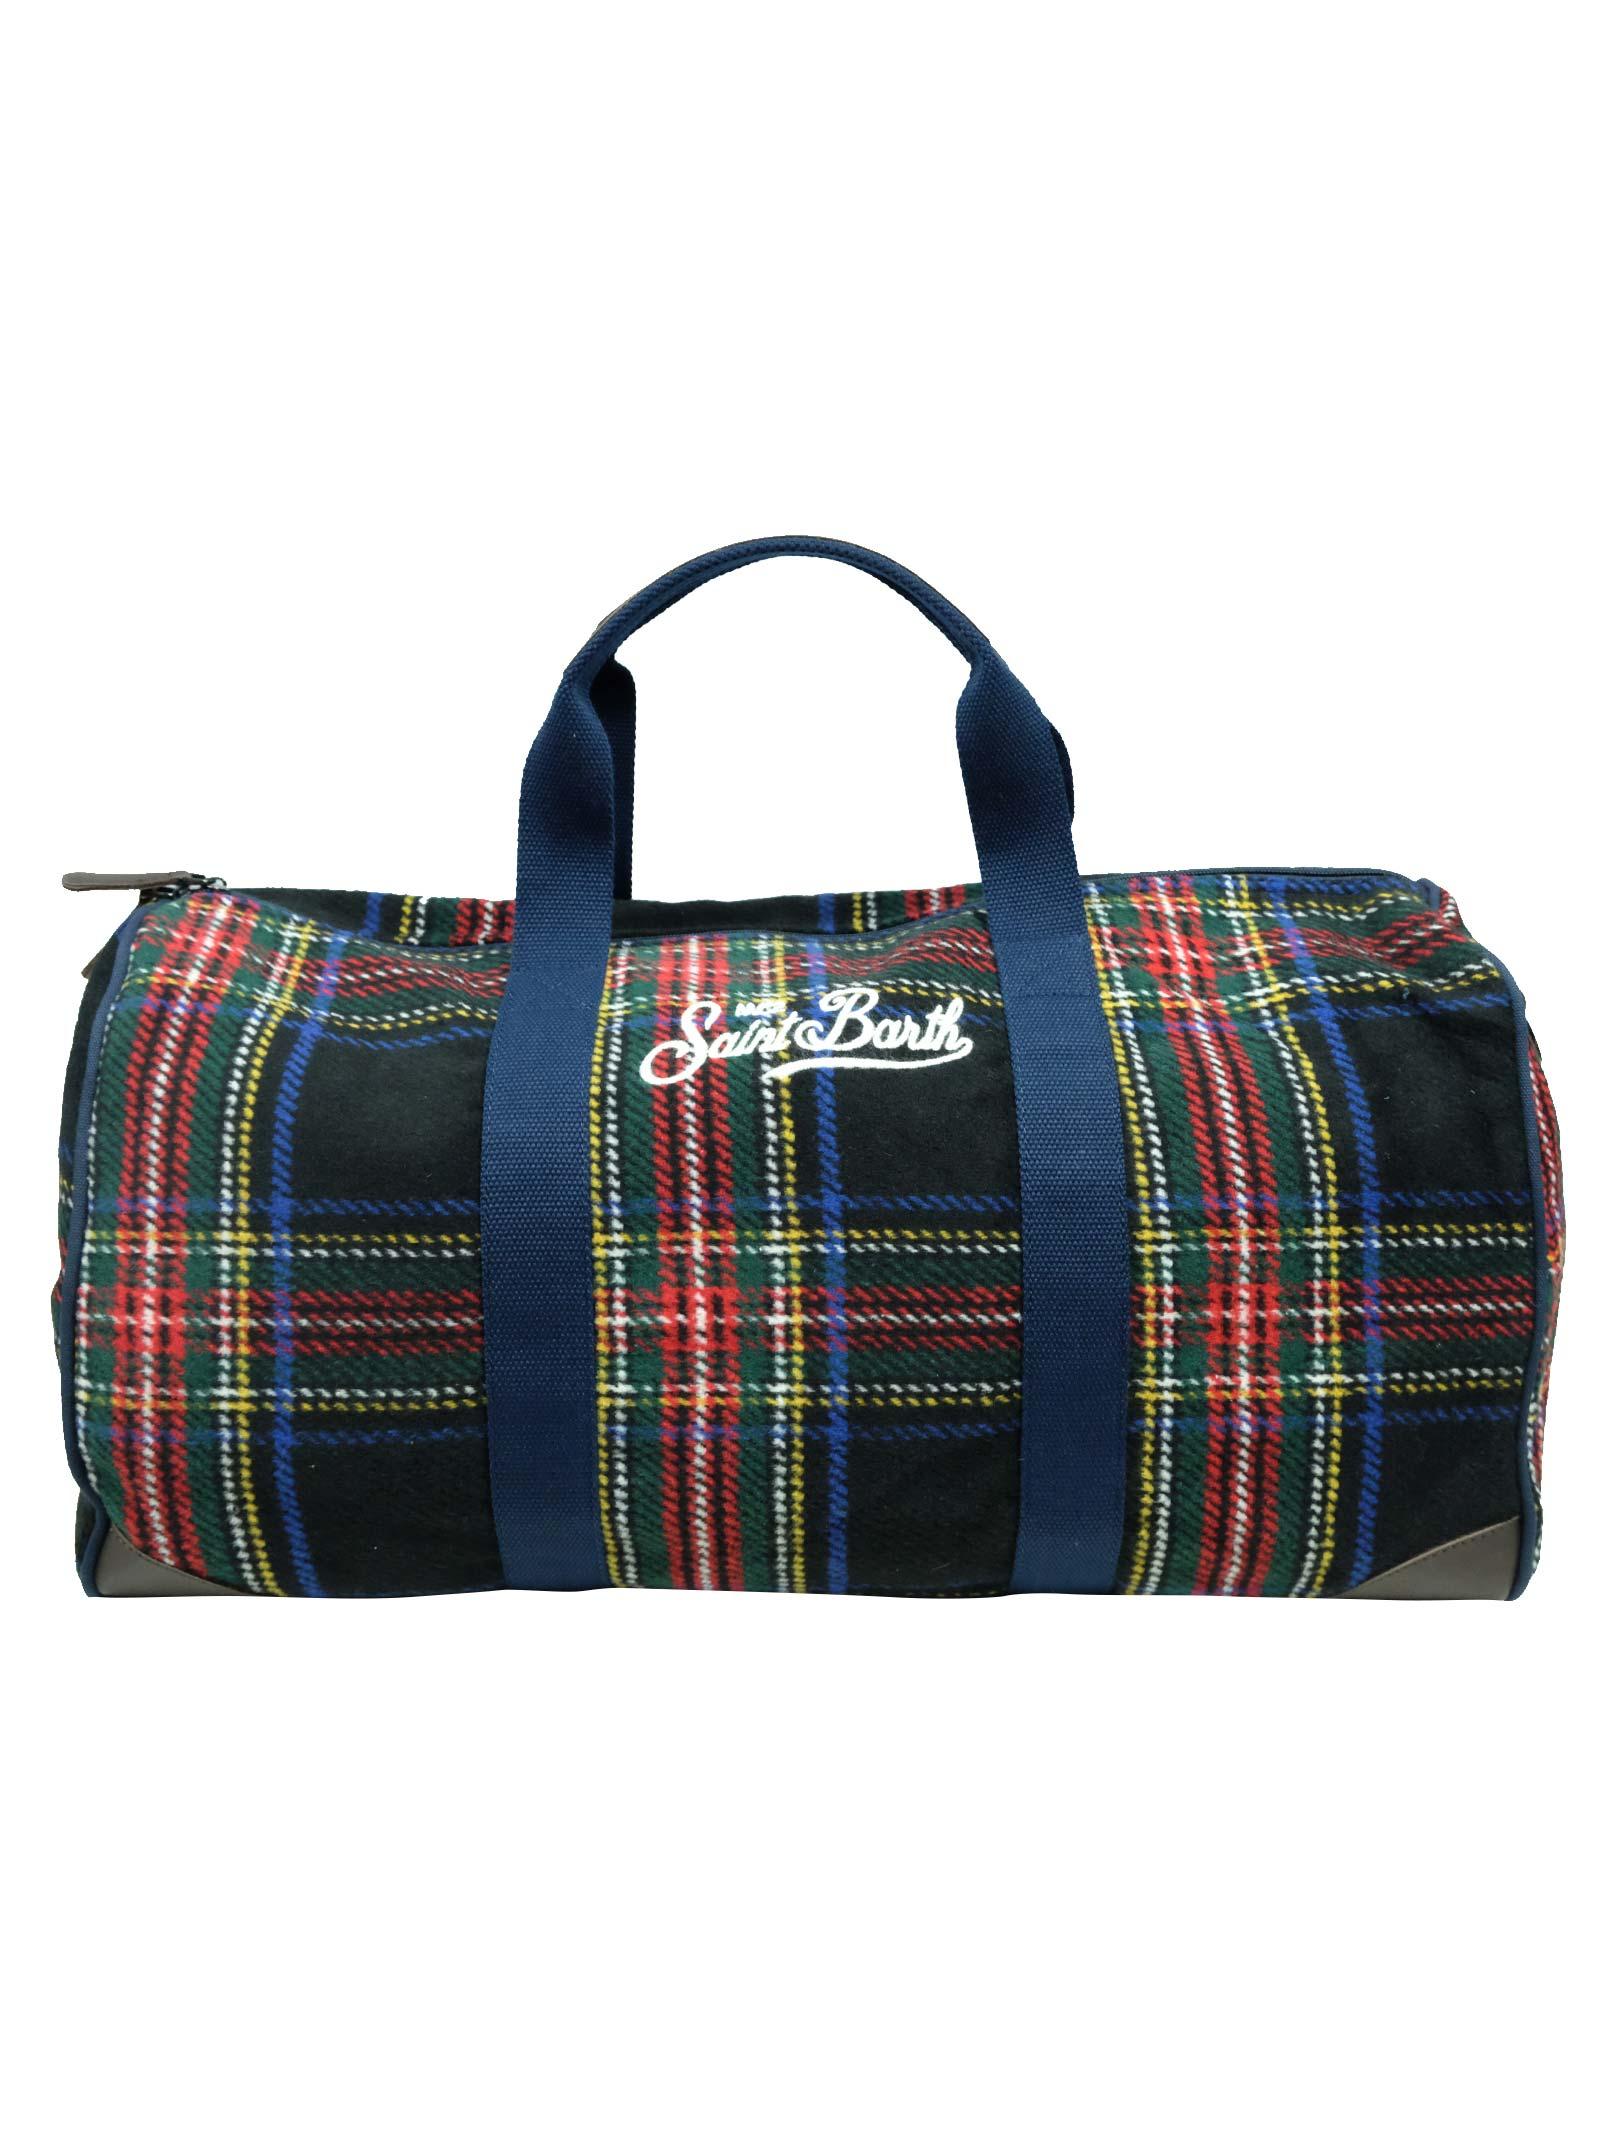 MC2  SAINT BARTH | Bags | JETLEGTRTN61